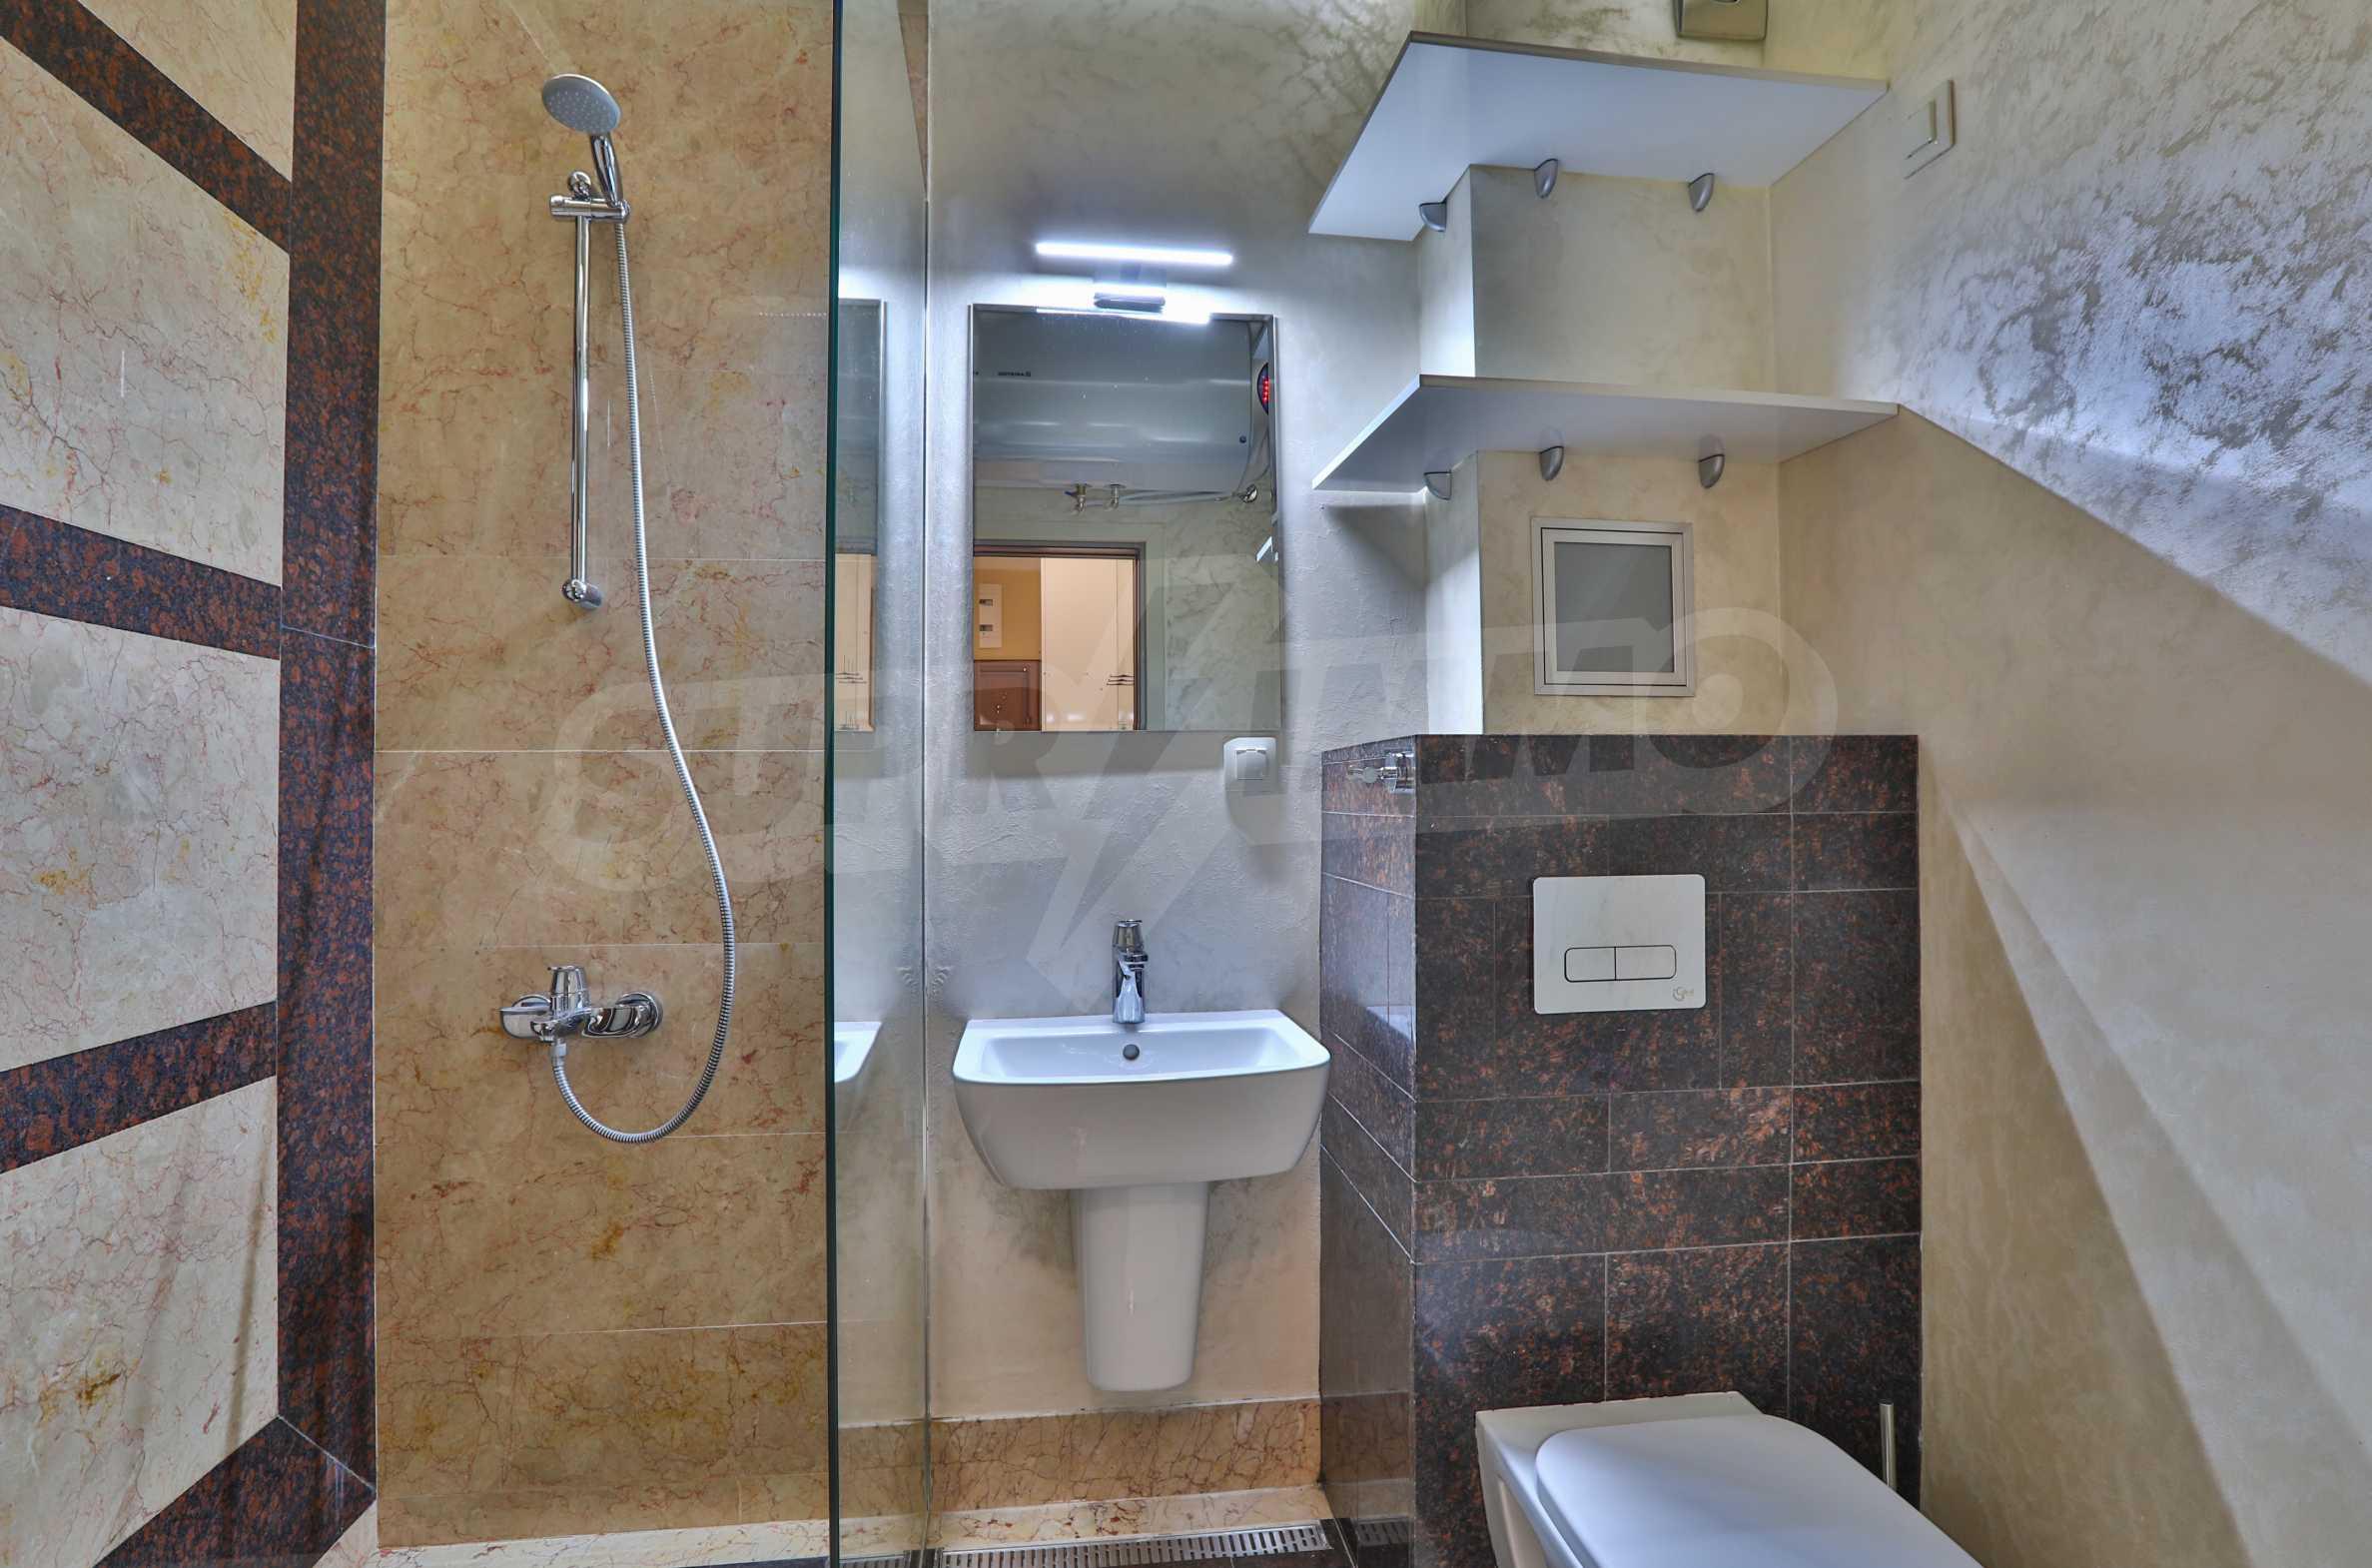 Exclusive 2-bedroom beachfront apartment in the prestigious Belle Époque Beach Residence 22